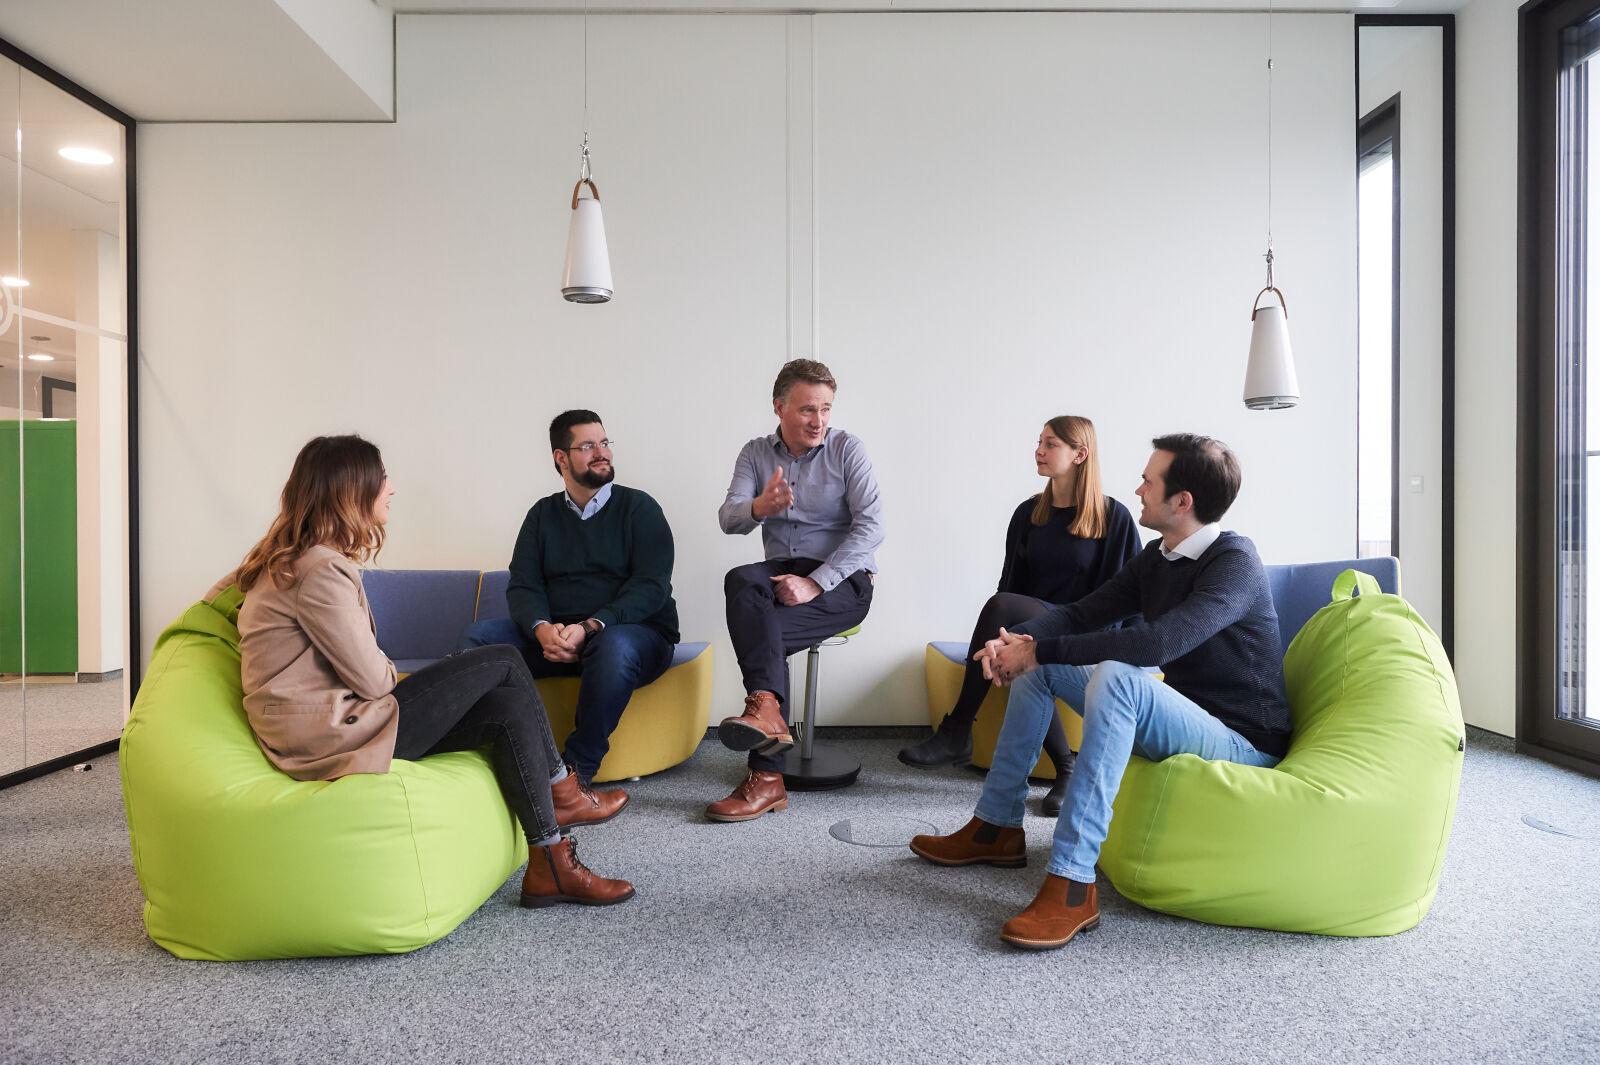 SAP S/4HANA Logistik Berater (m/w/d) - Job Bremen, Homeoffice - Jobs | team neusta Karriereportal